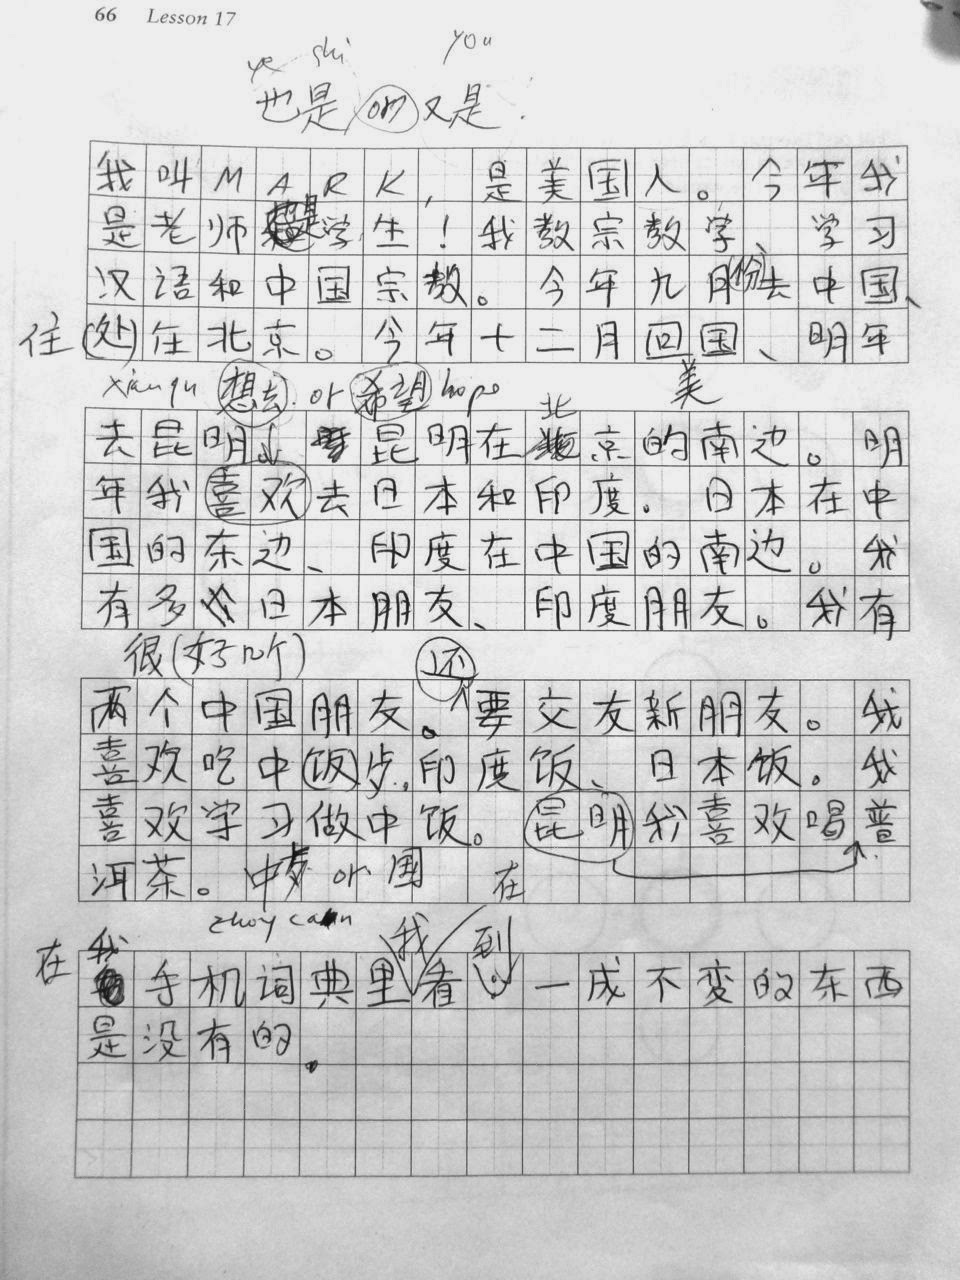 015 Essay Example Chinese Amazing Art Topics Vce Formats Sheet Full